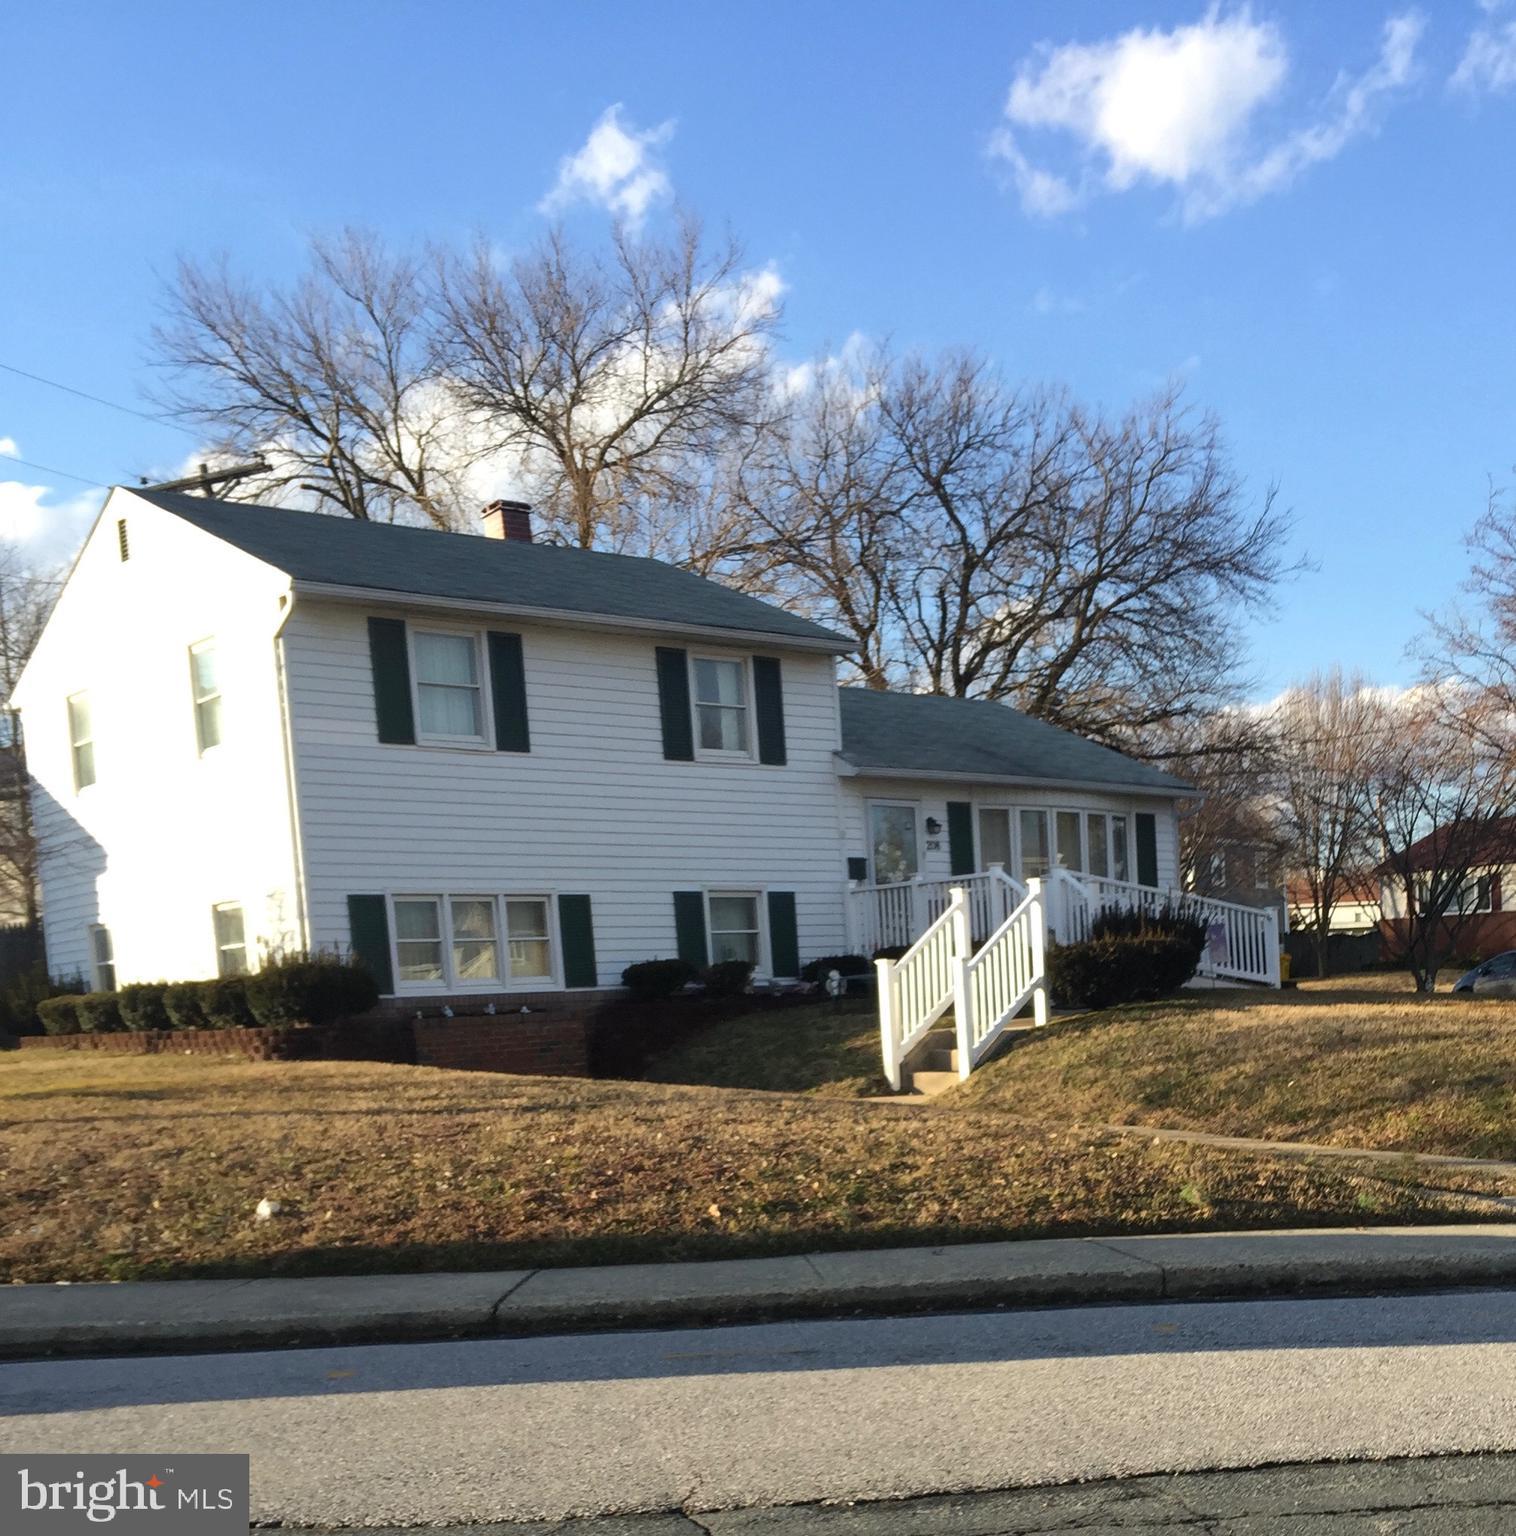 208 RIDGELY ROAD, GLEN BURNIE, Maryland 21061, 3 Bedrooms Bedrooms, ,1 BathroomBathrooms,Single Family,For Sale,208 RIDGELY ROAD,MDAA460644